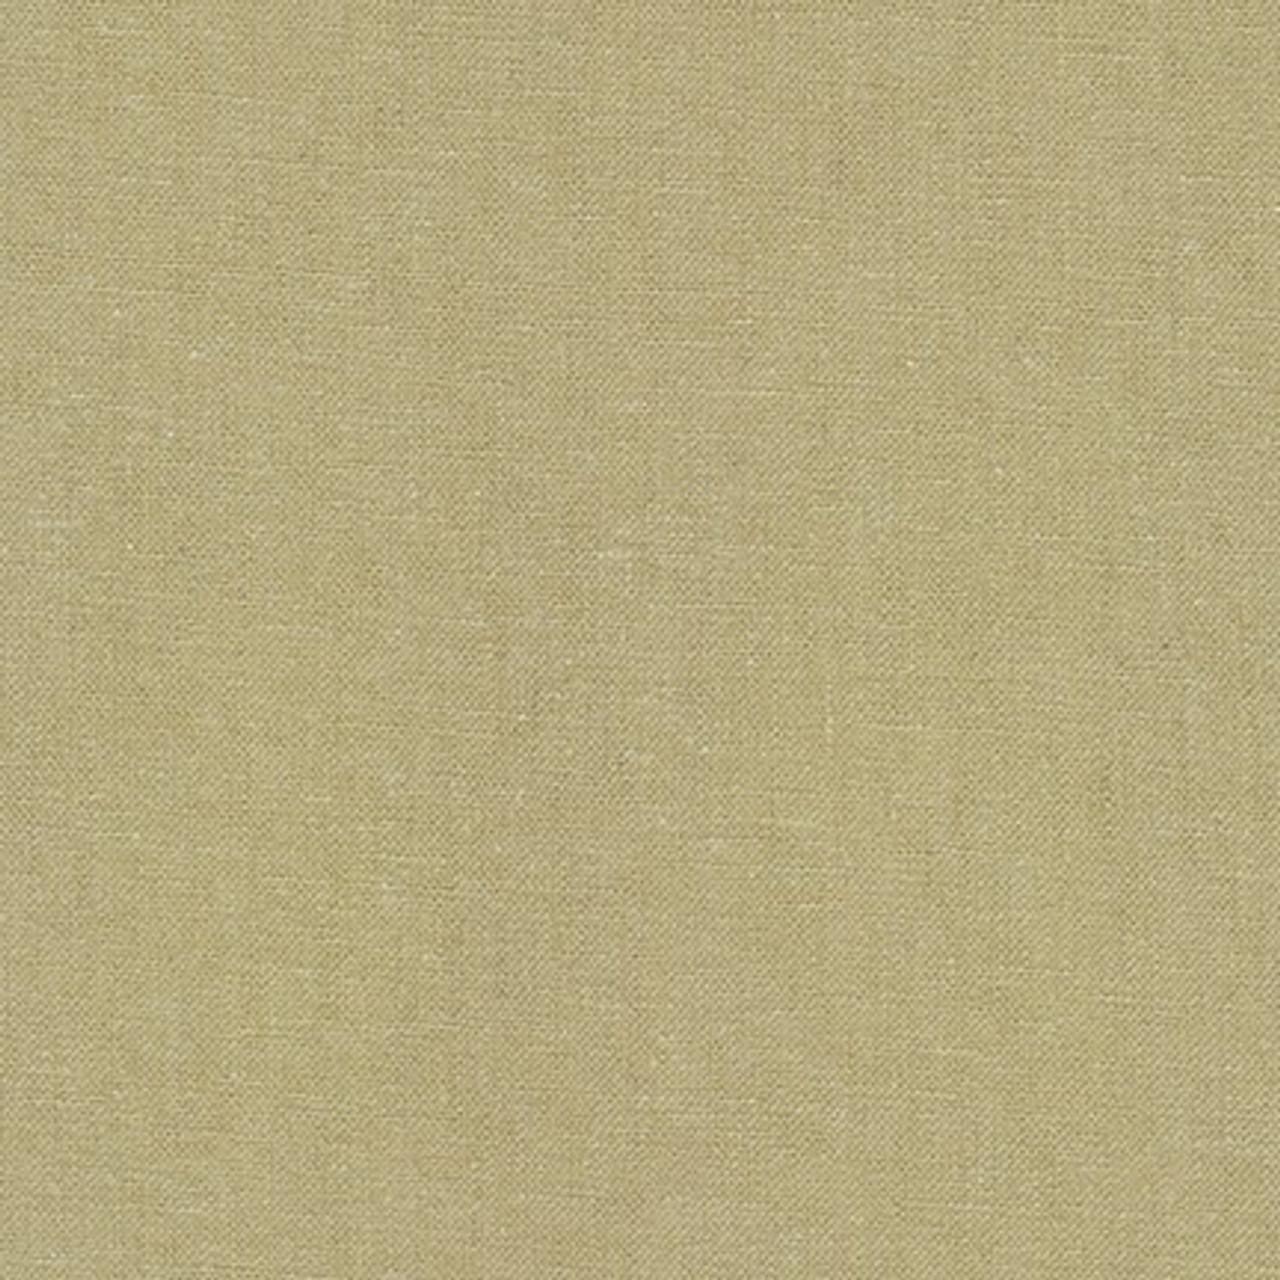 Essex Yarn Dyed - Sweat Pea